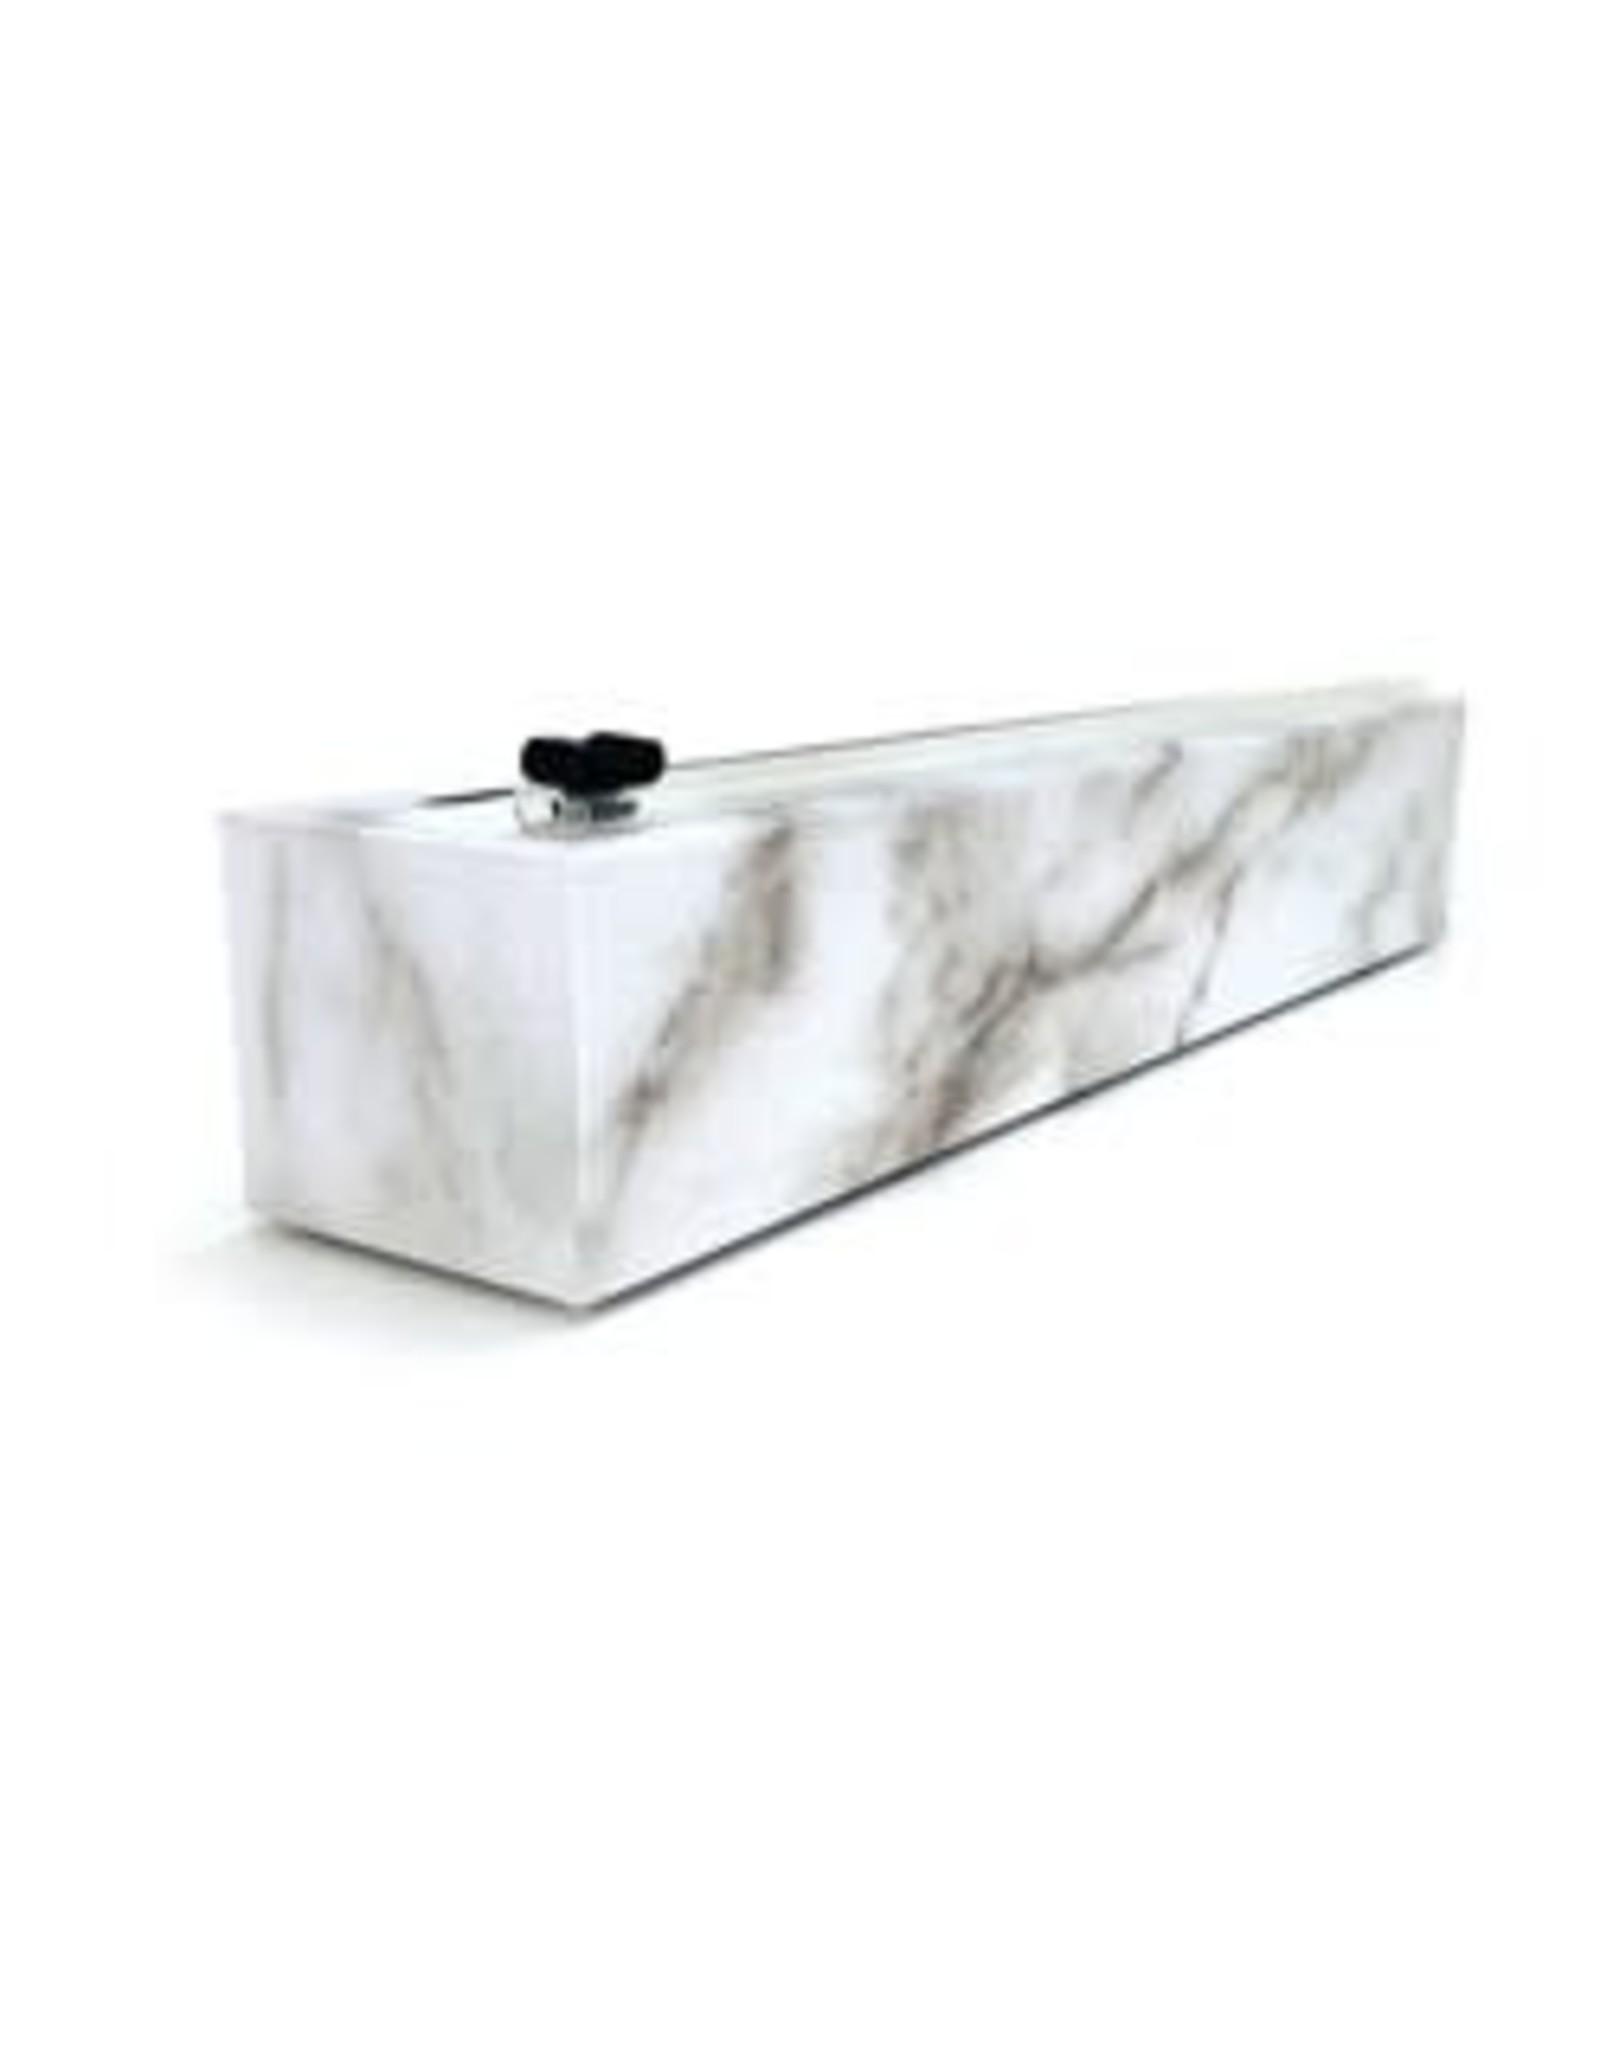 "CHICWRAP-Dispenser Carrara Marble Plastic Wrap 12"" x 250'"